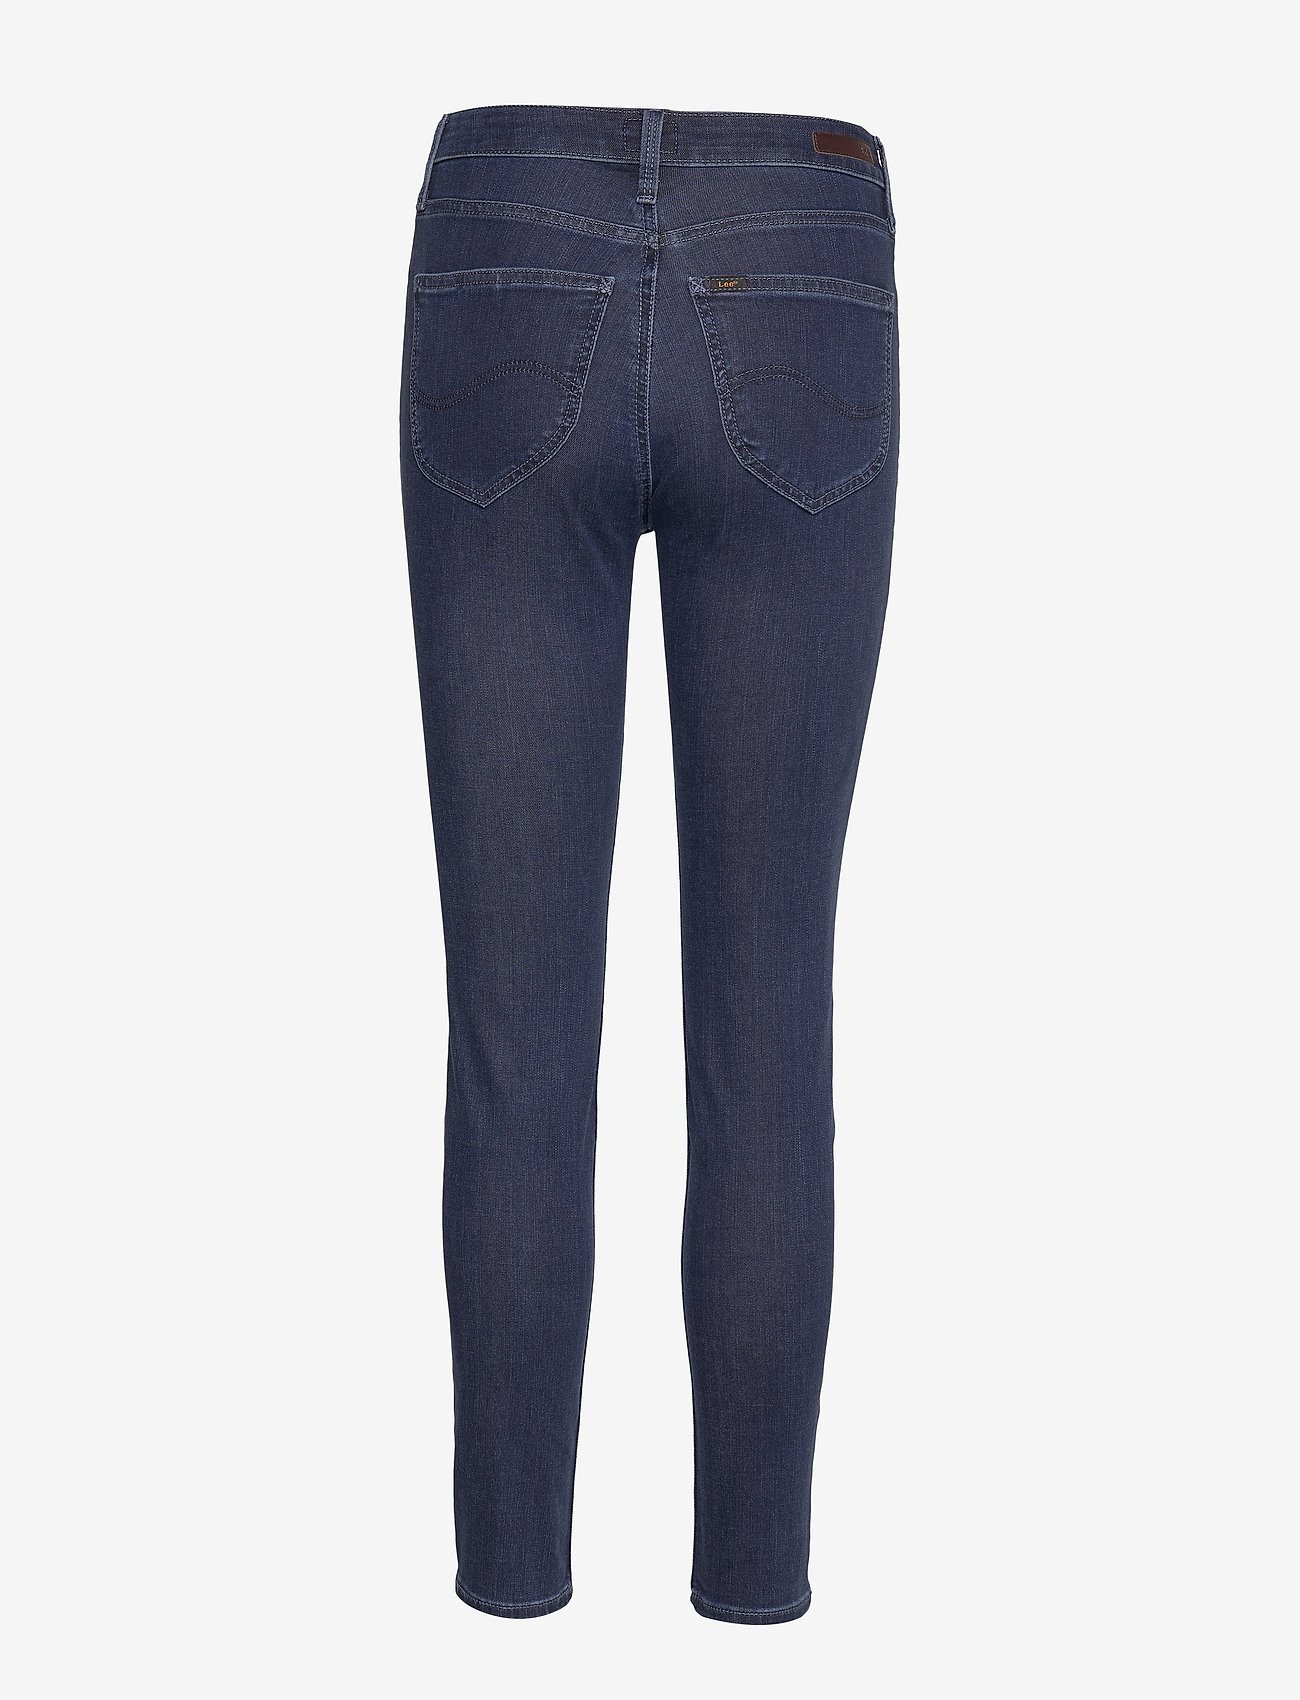 Scarlett High (Blueberry) (359.60 kr) - Lee Jeans